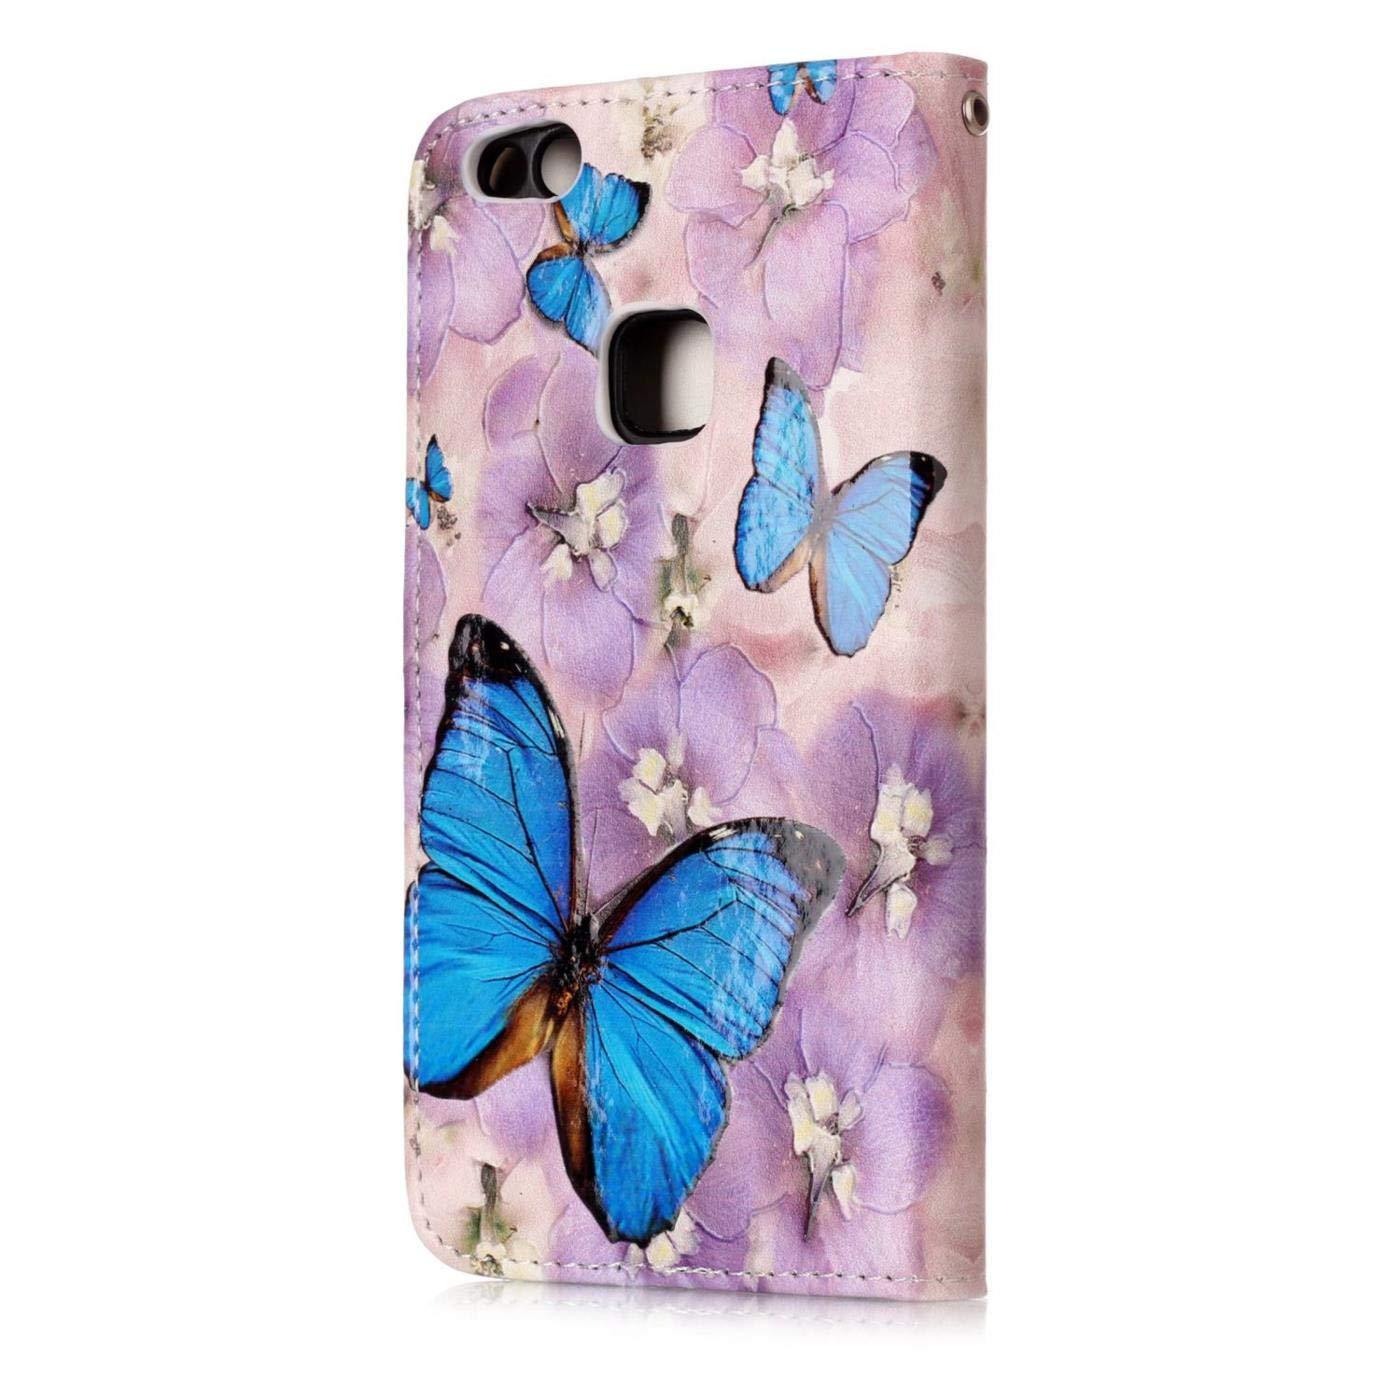 Campanas de Viento Funda para Huawei P10 Lite Carcasa con Tapa Libro 360 Grados PU Leather con TPU Silicona Bumper Case Completa Protectora Folio Tarjetero Flip Leather Case Wallet Cover